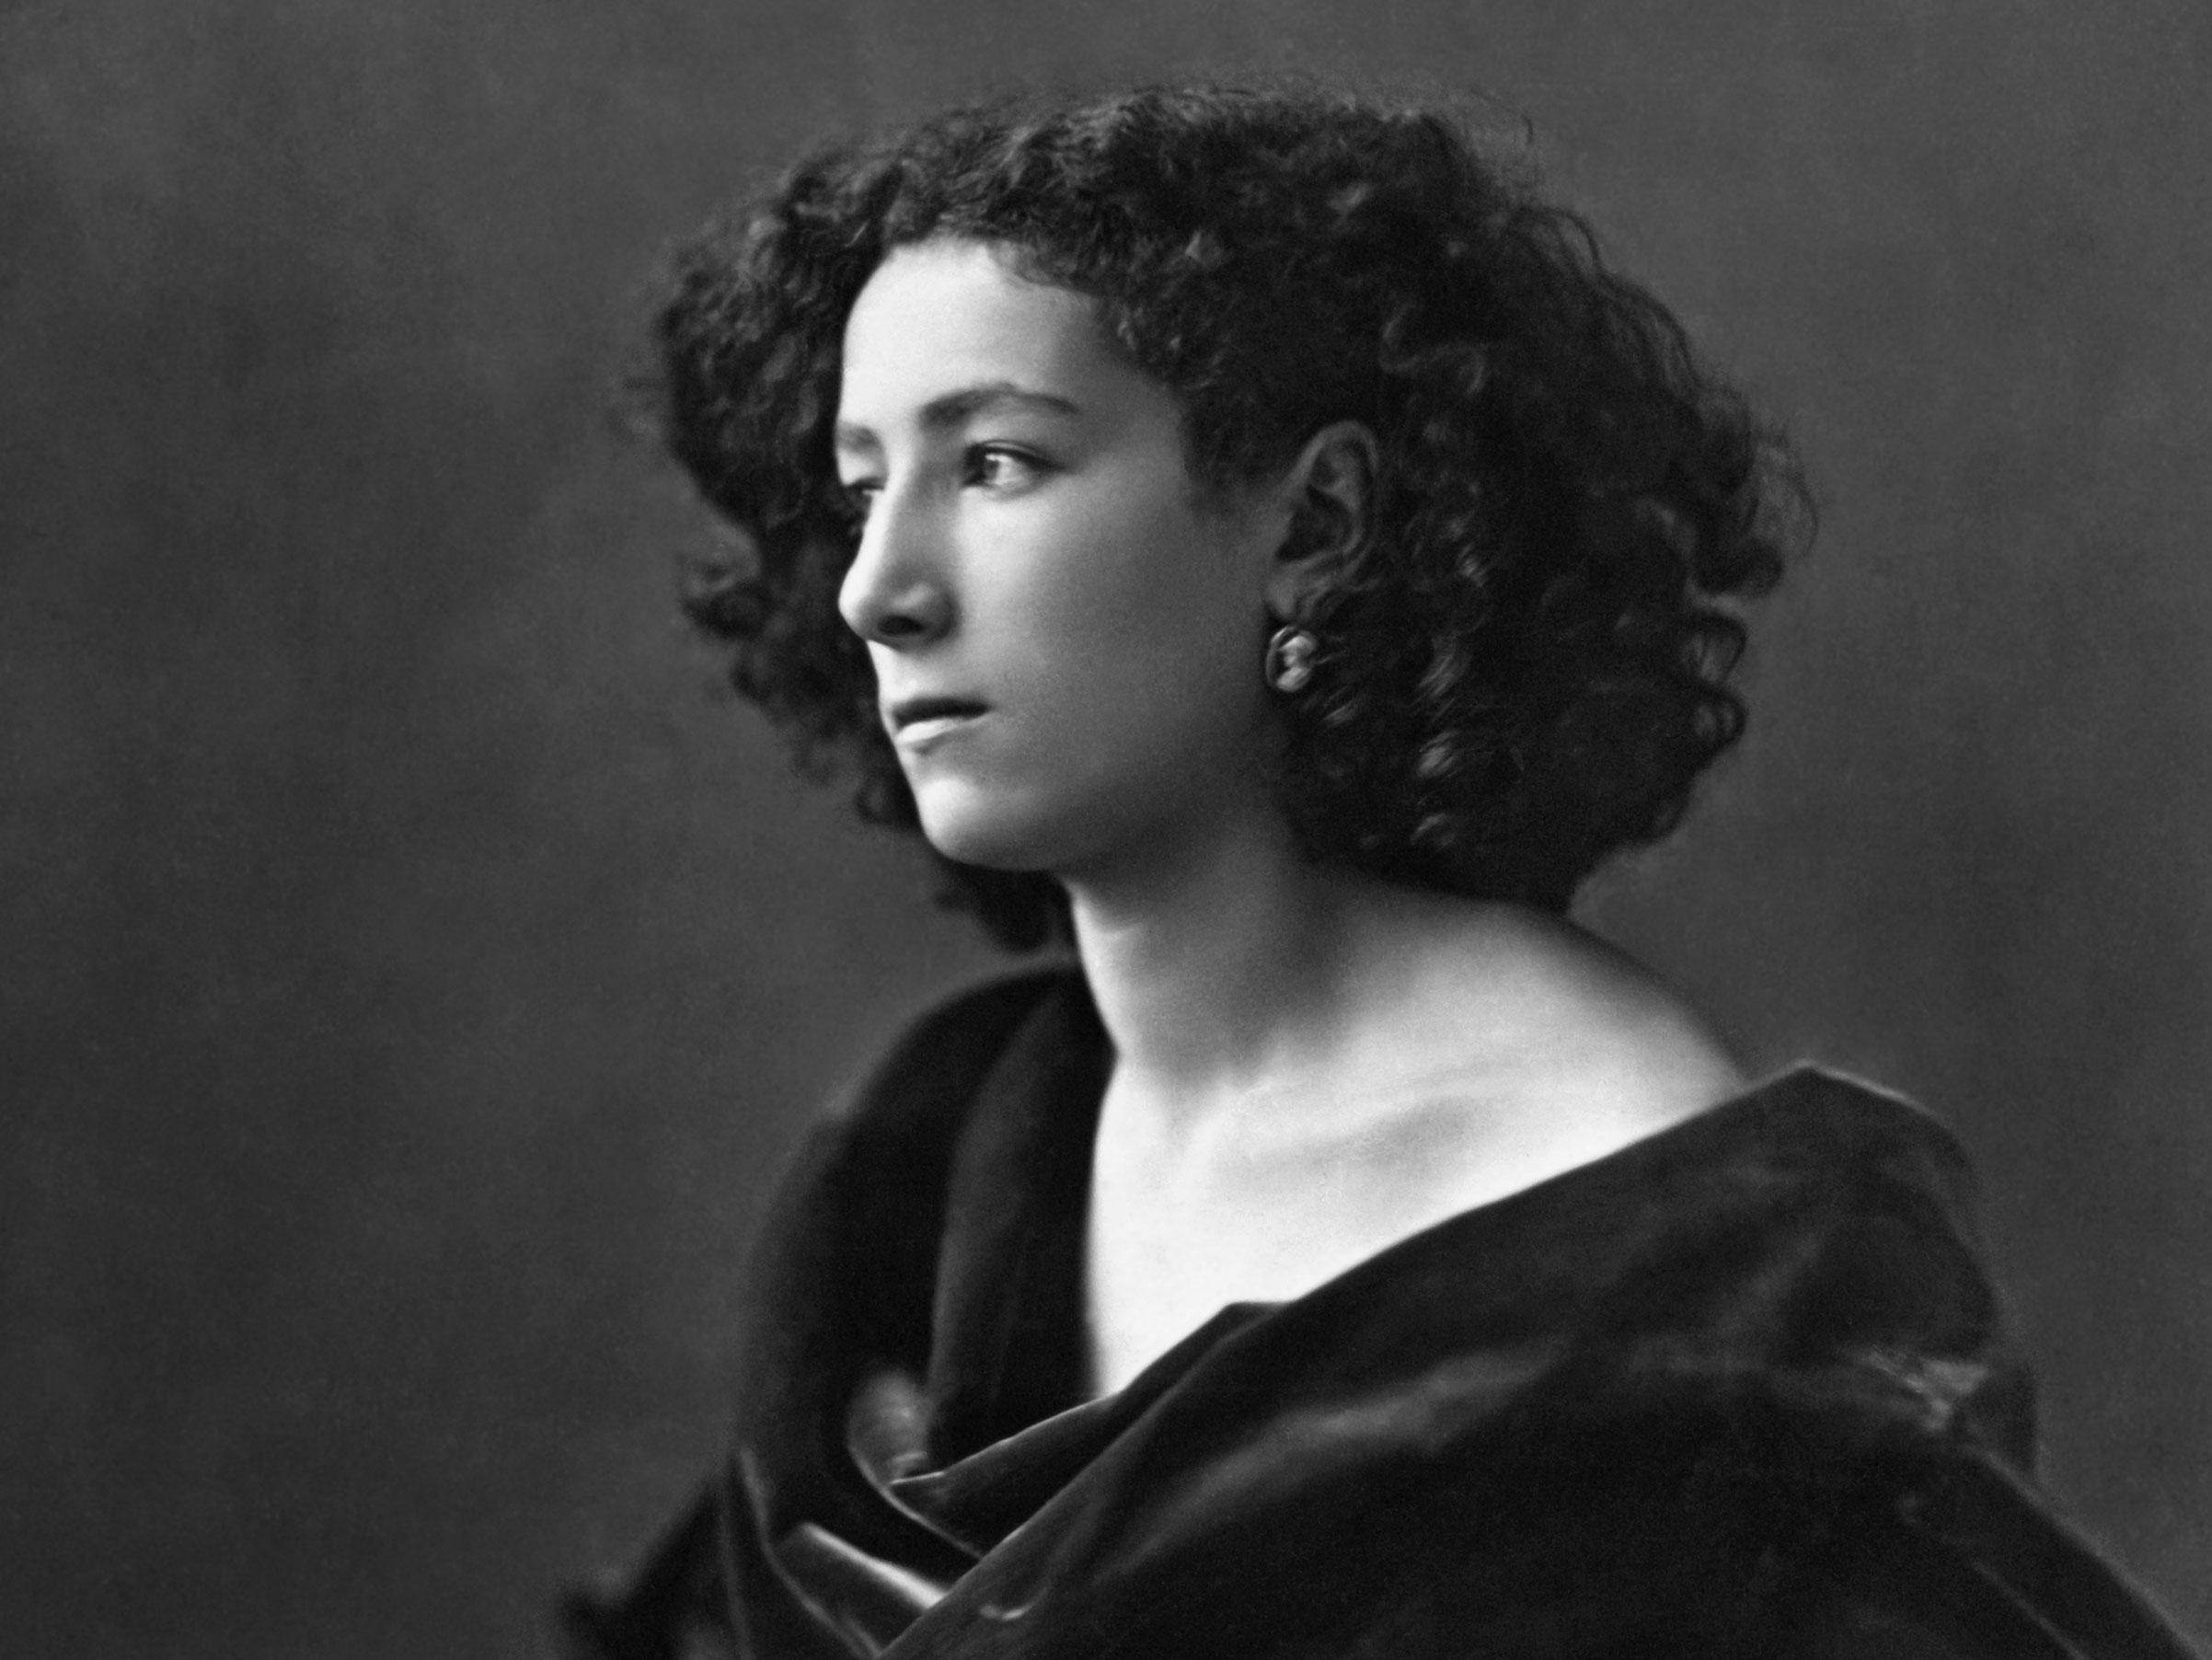 Sarah Bernhardt's Knee: The Feminine Ideal in Belle Époque Rio de Janeiro